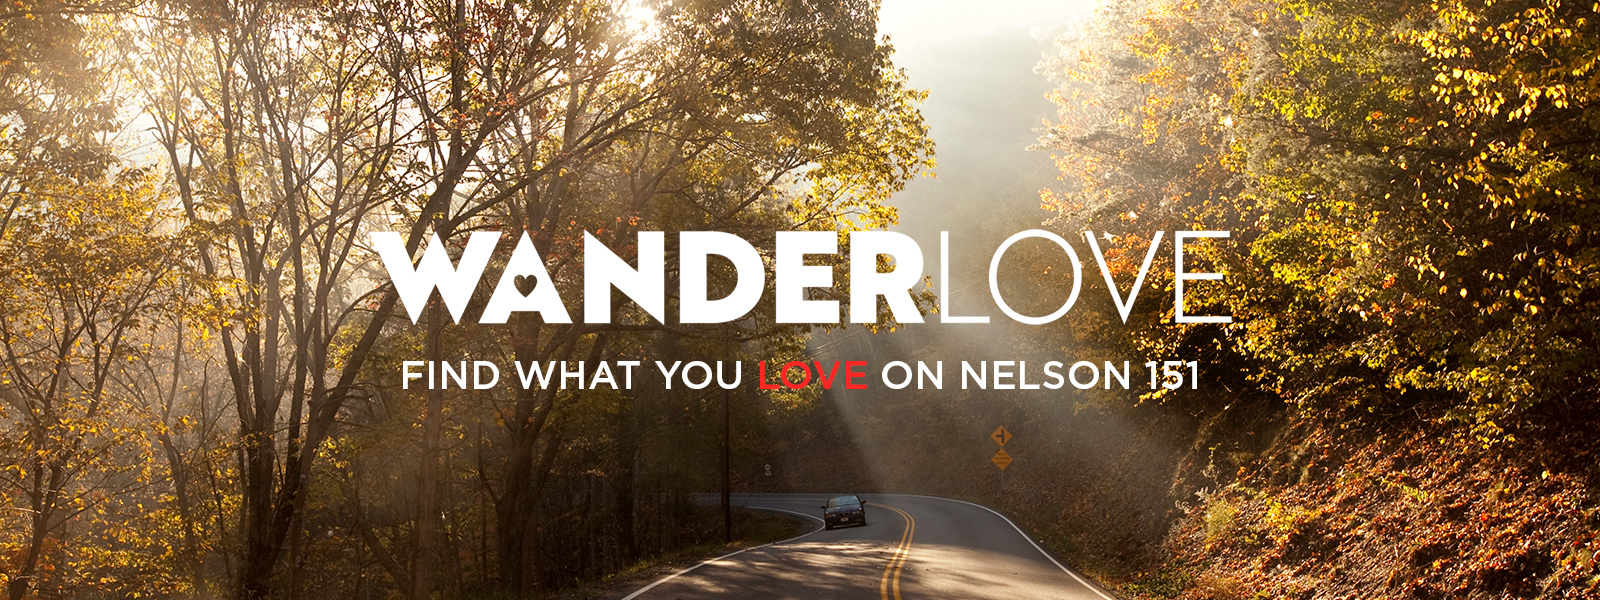 WanderLove Nelson 151